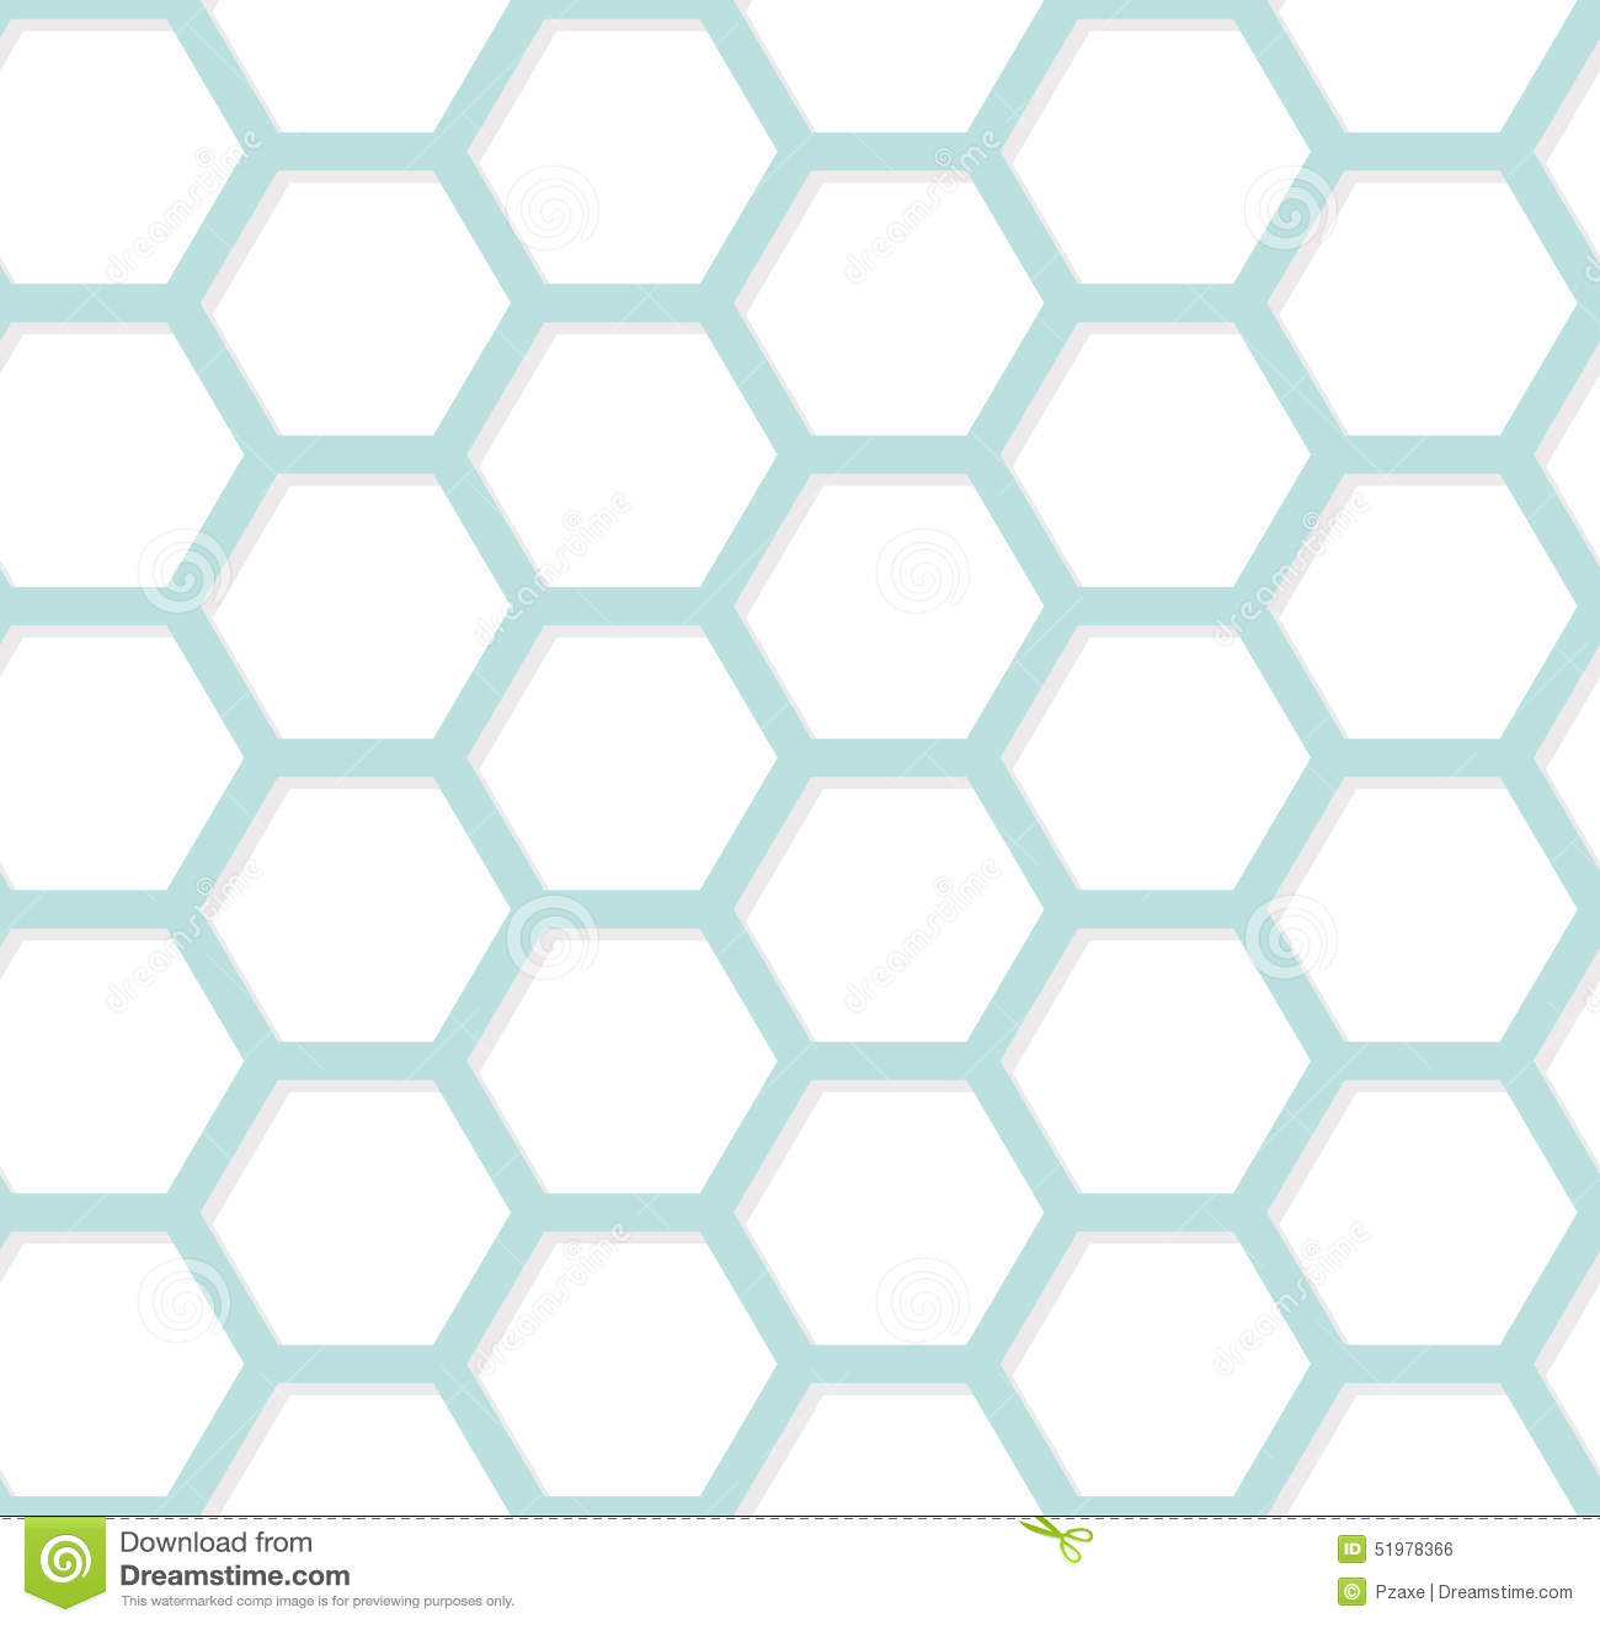 modern geometric hexagonal background vector abstract